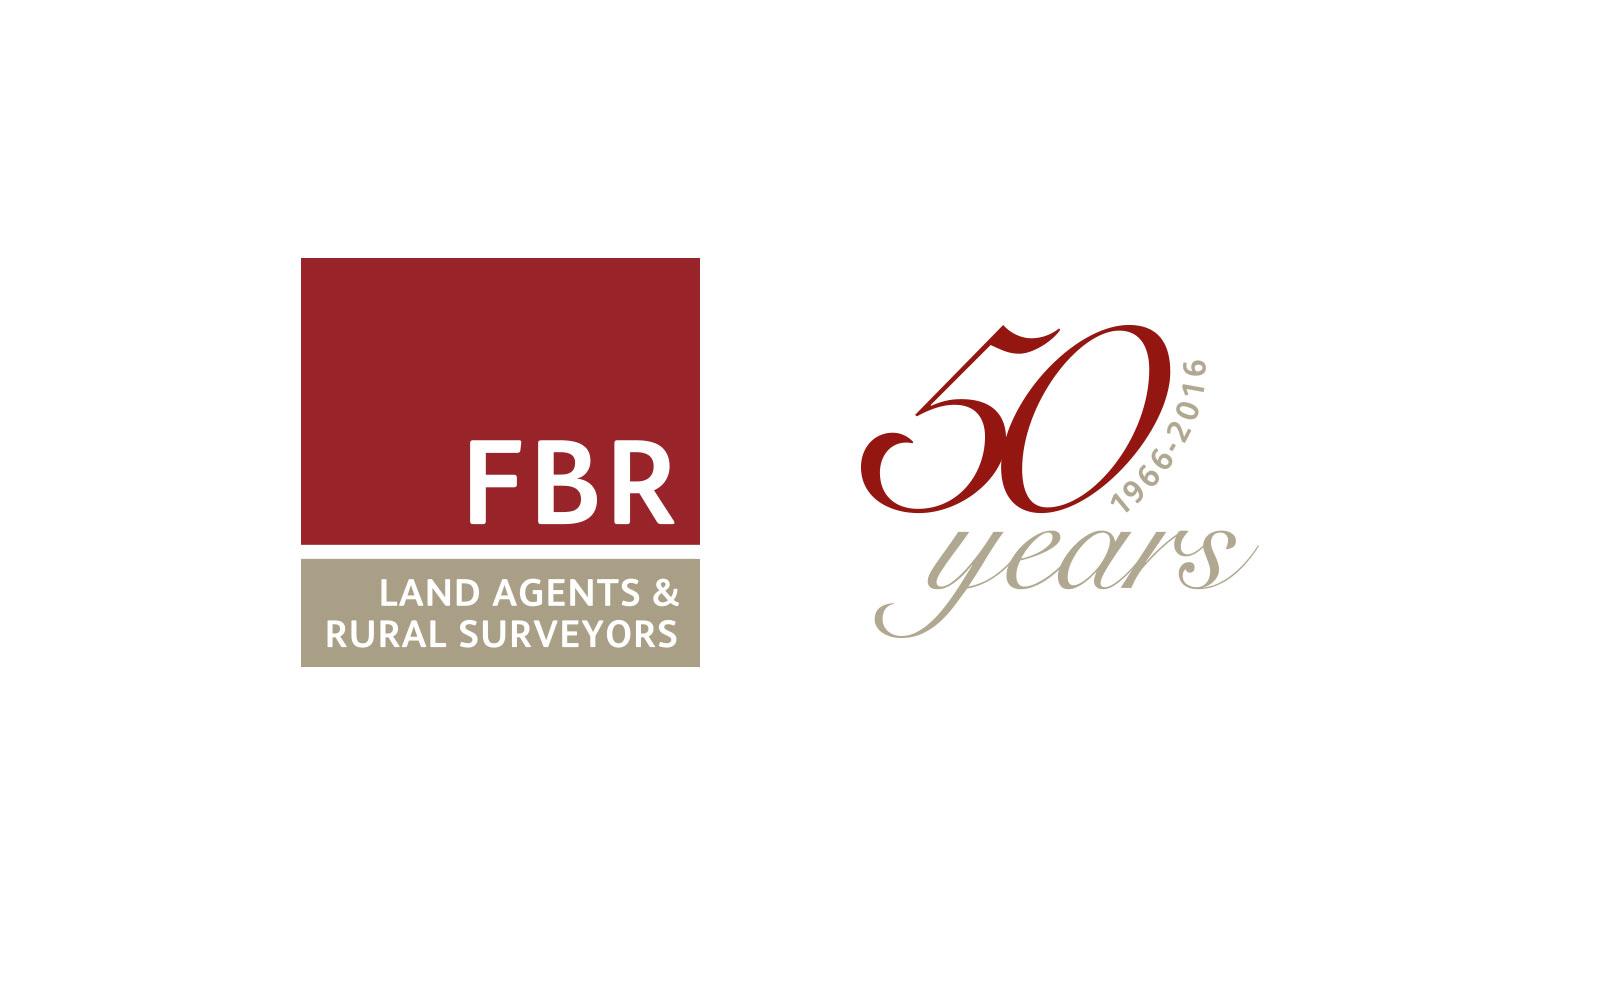 FBR-Logos